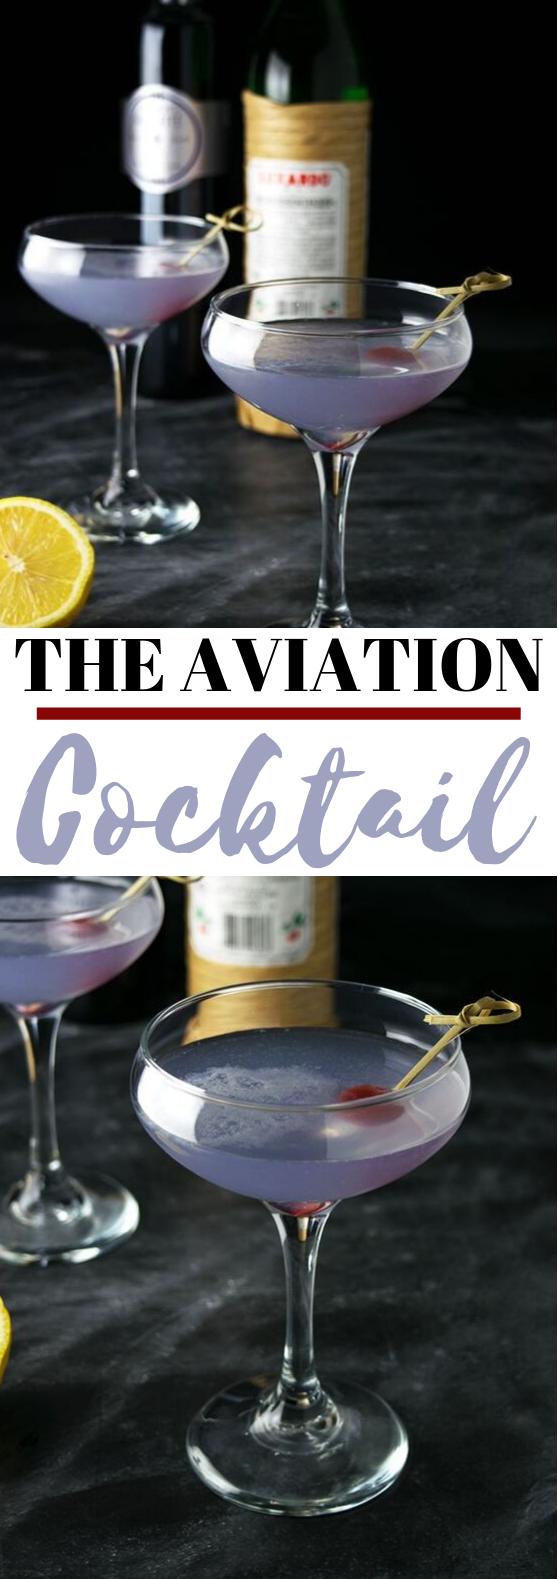 Aviation Cocktail #drinks #cocktails